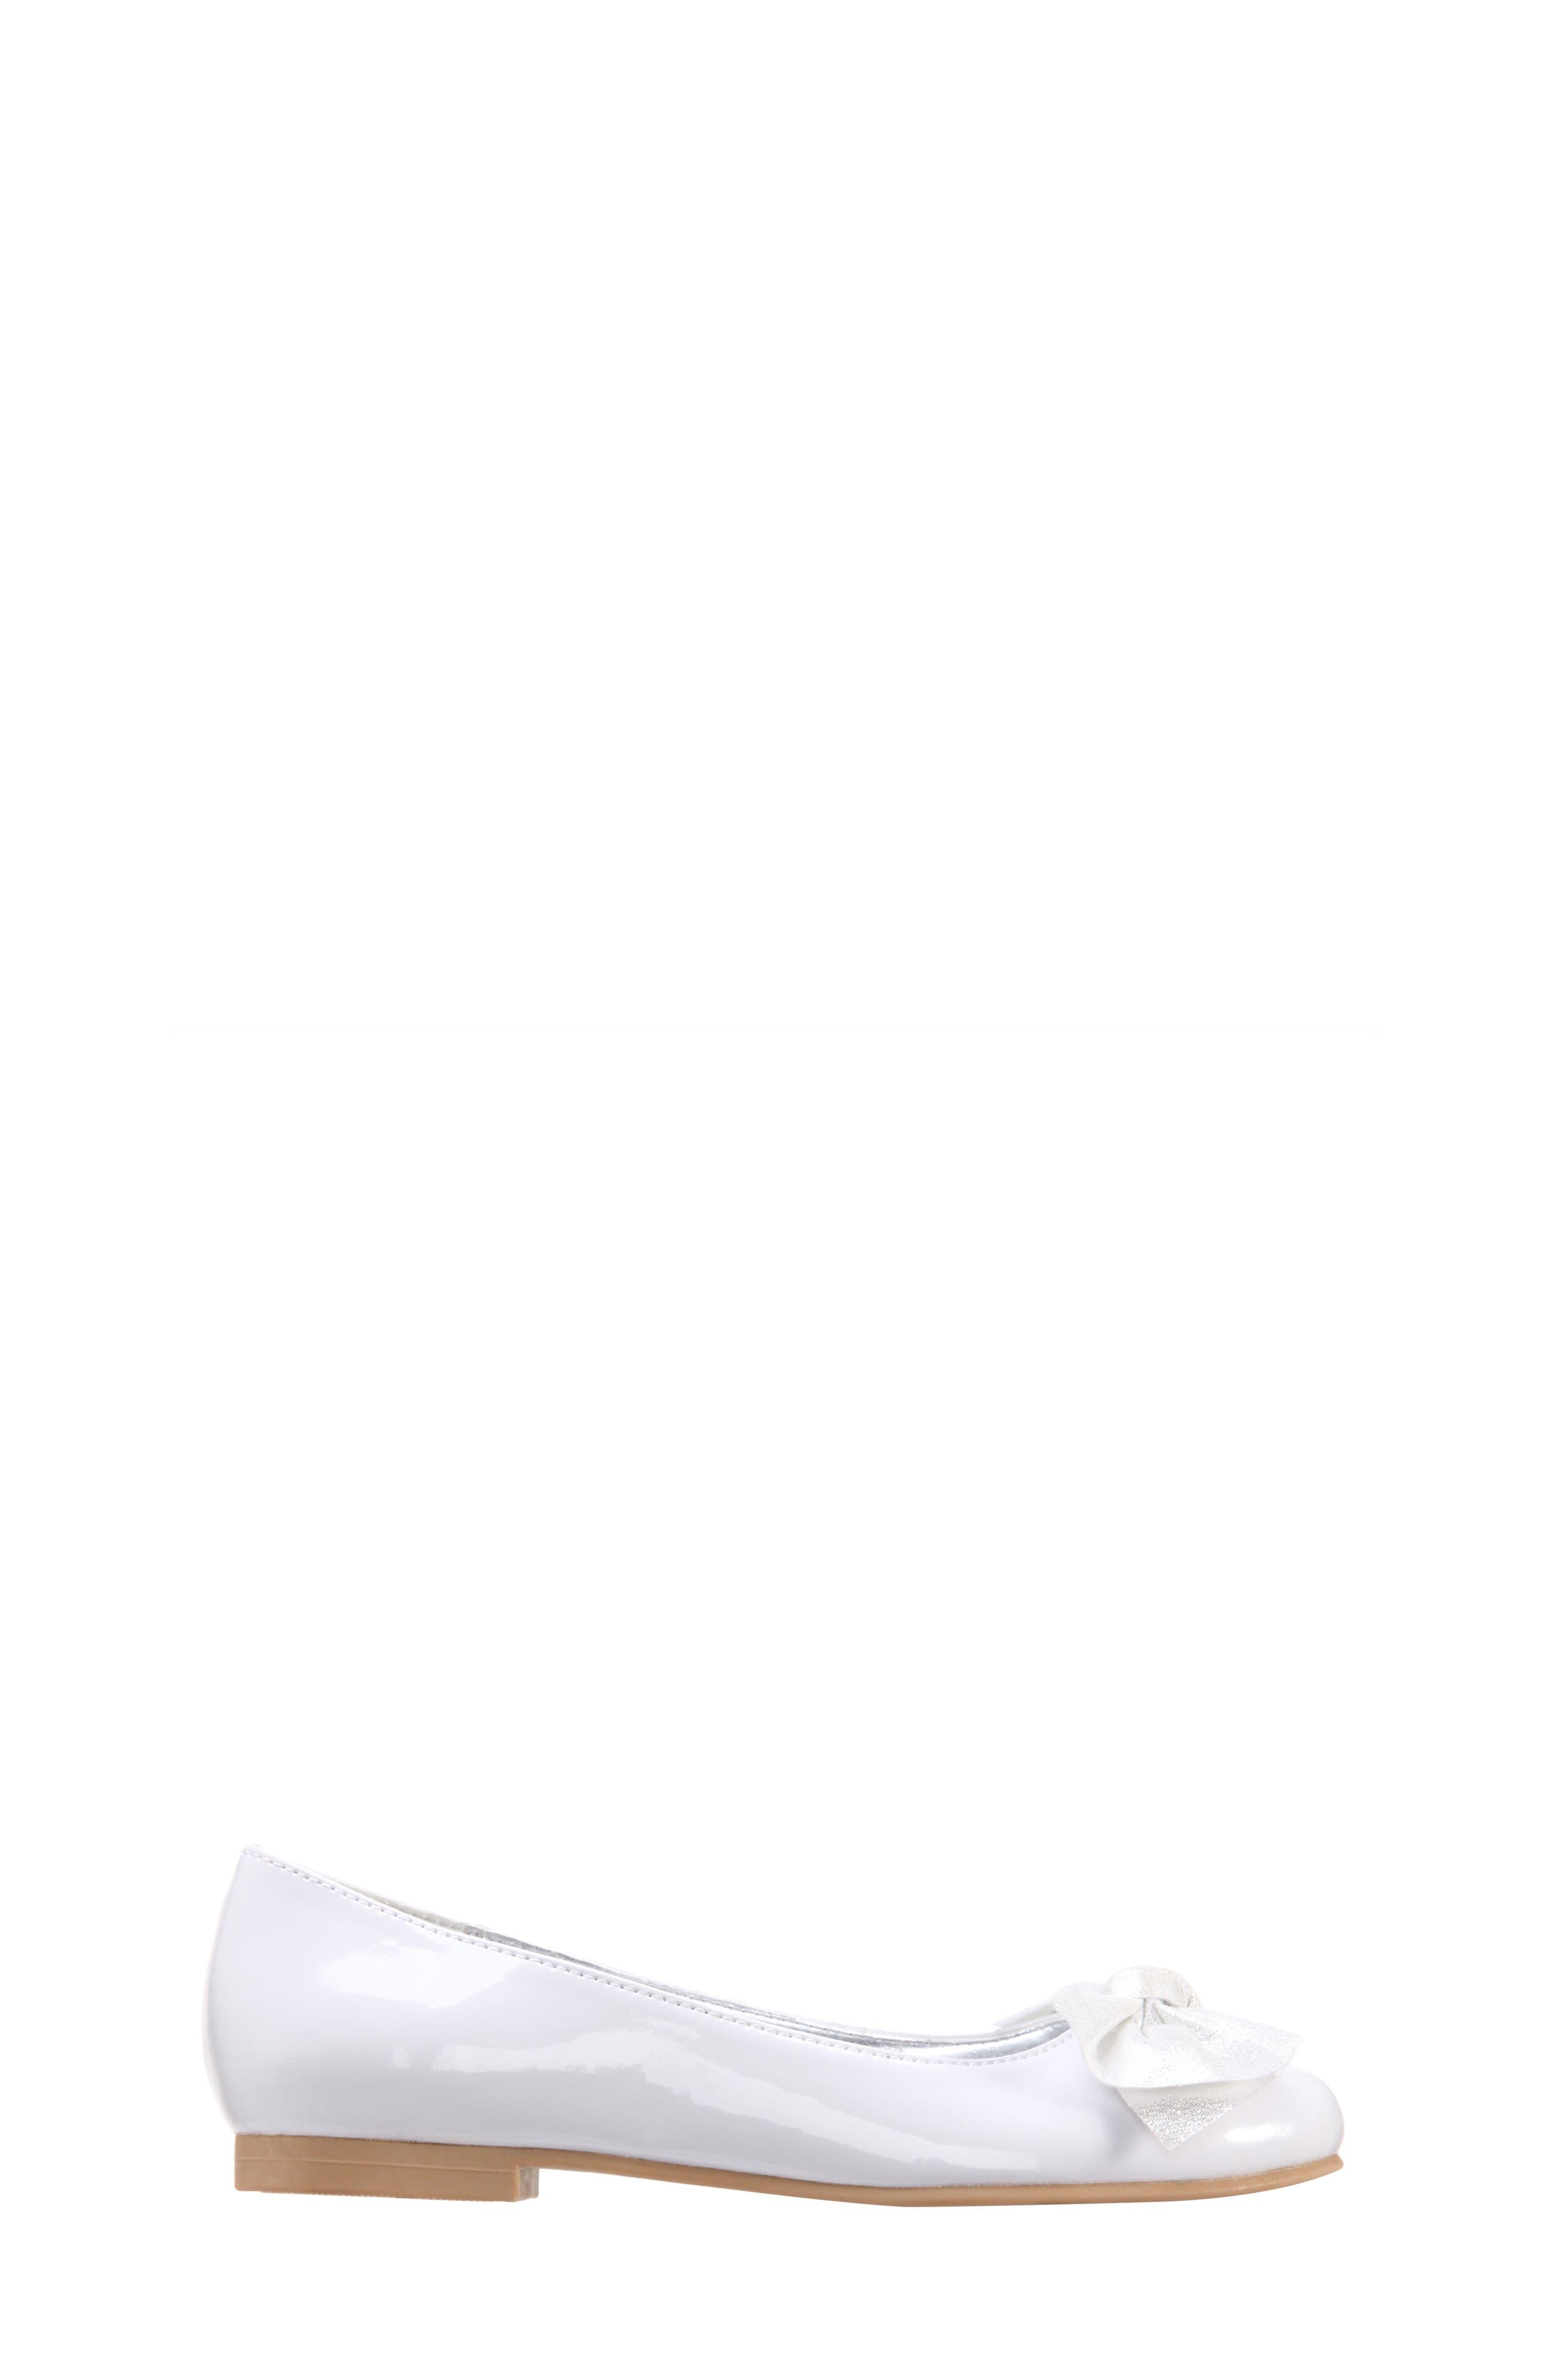 Katelyn Glitter Bow Metallic Ballet Flat,                             Alternate thumbnail 3, color,                             White Patent